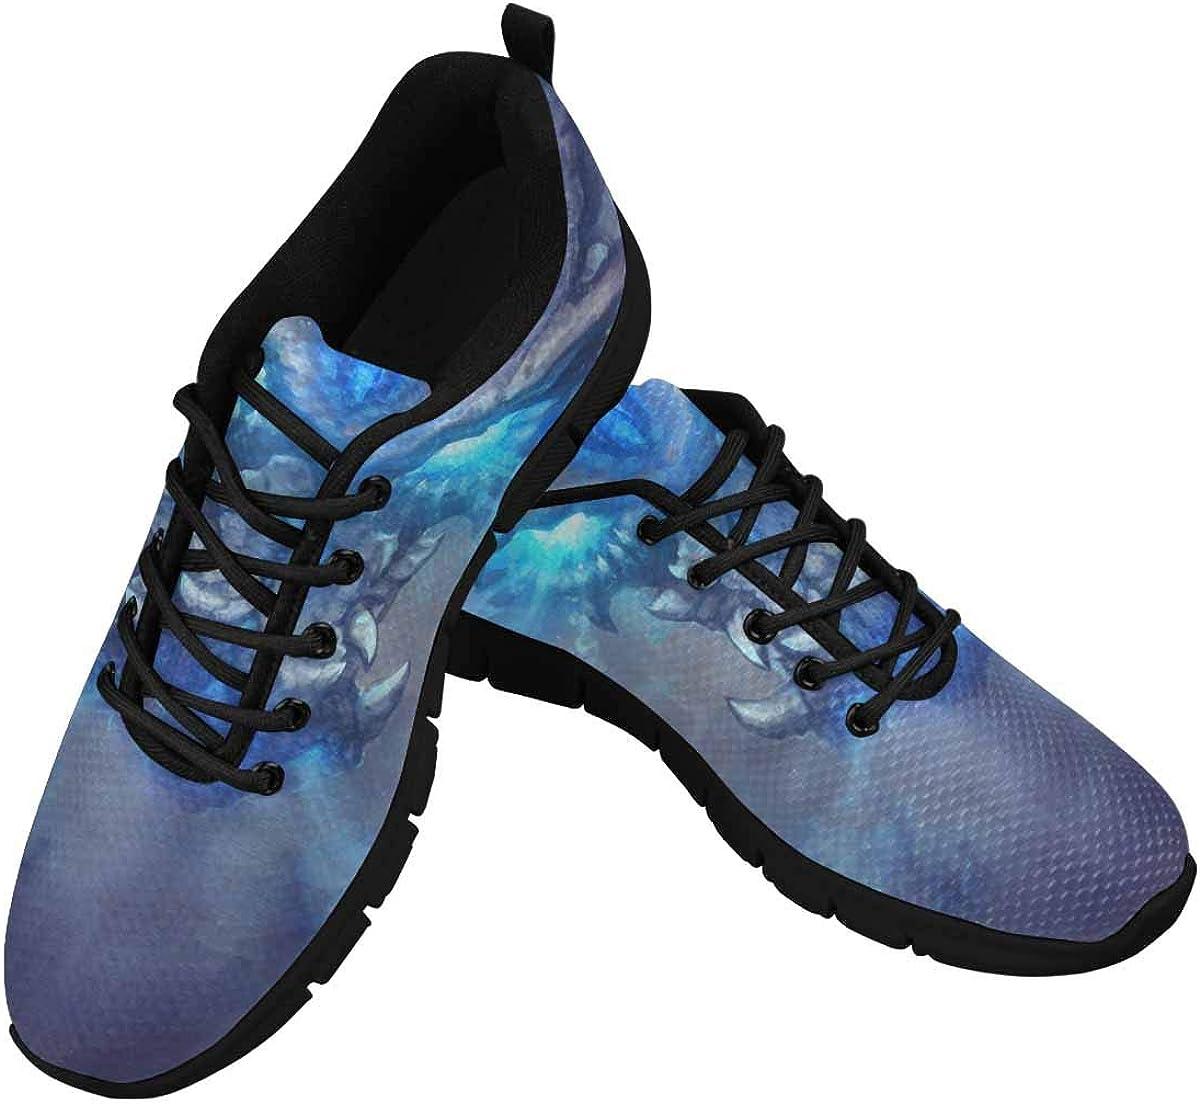 INTERESTPRINT A Huge White Dragon Women's Athletic Walking Shoes Breathe Comfort Mesh